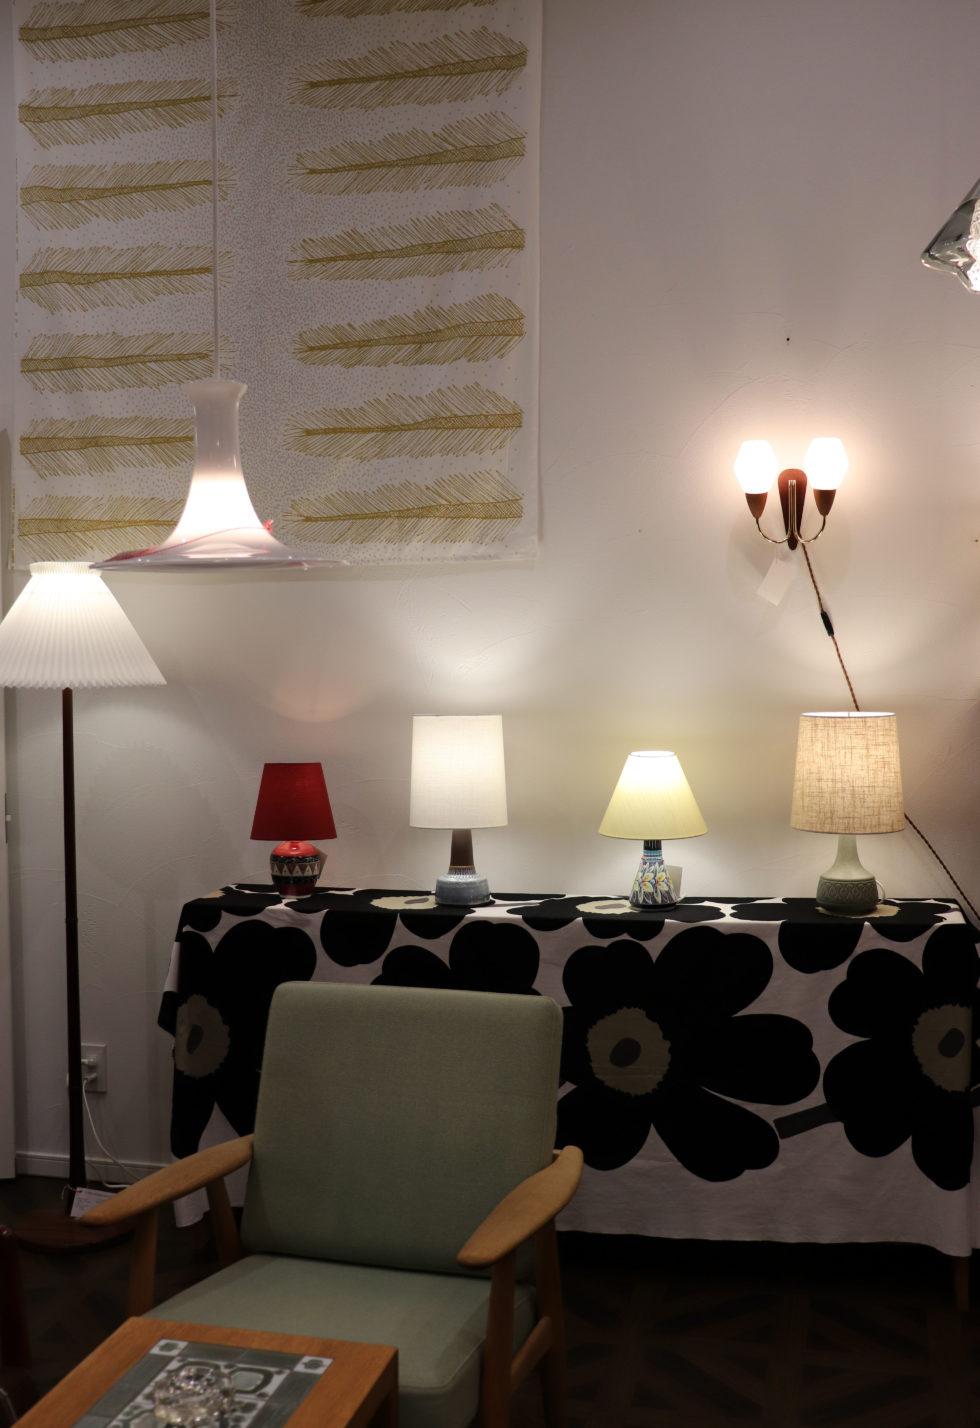 nordic vintage lamp leklint soholm poulhenningsen wegner rorstrand marimekko fujiwo ishimoto holmegaard